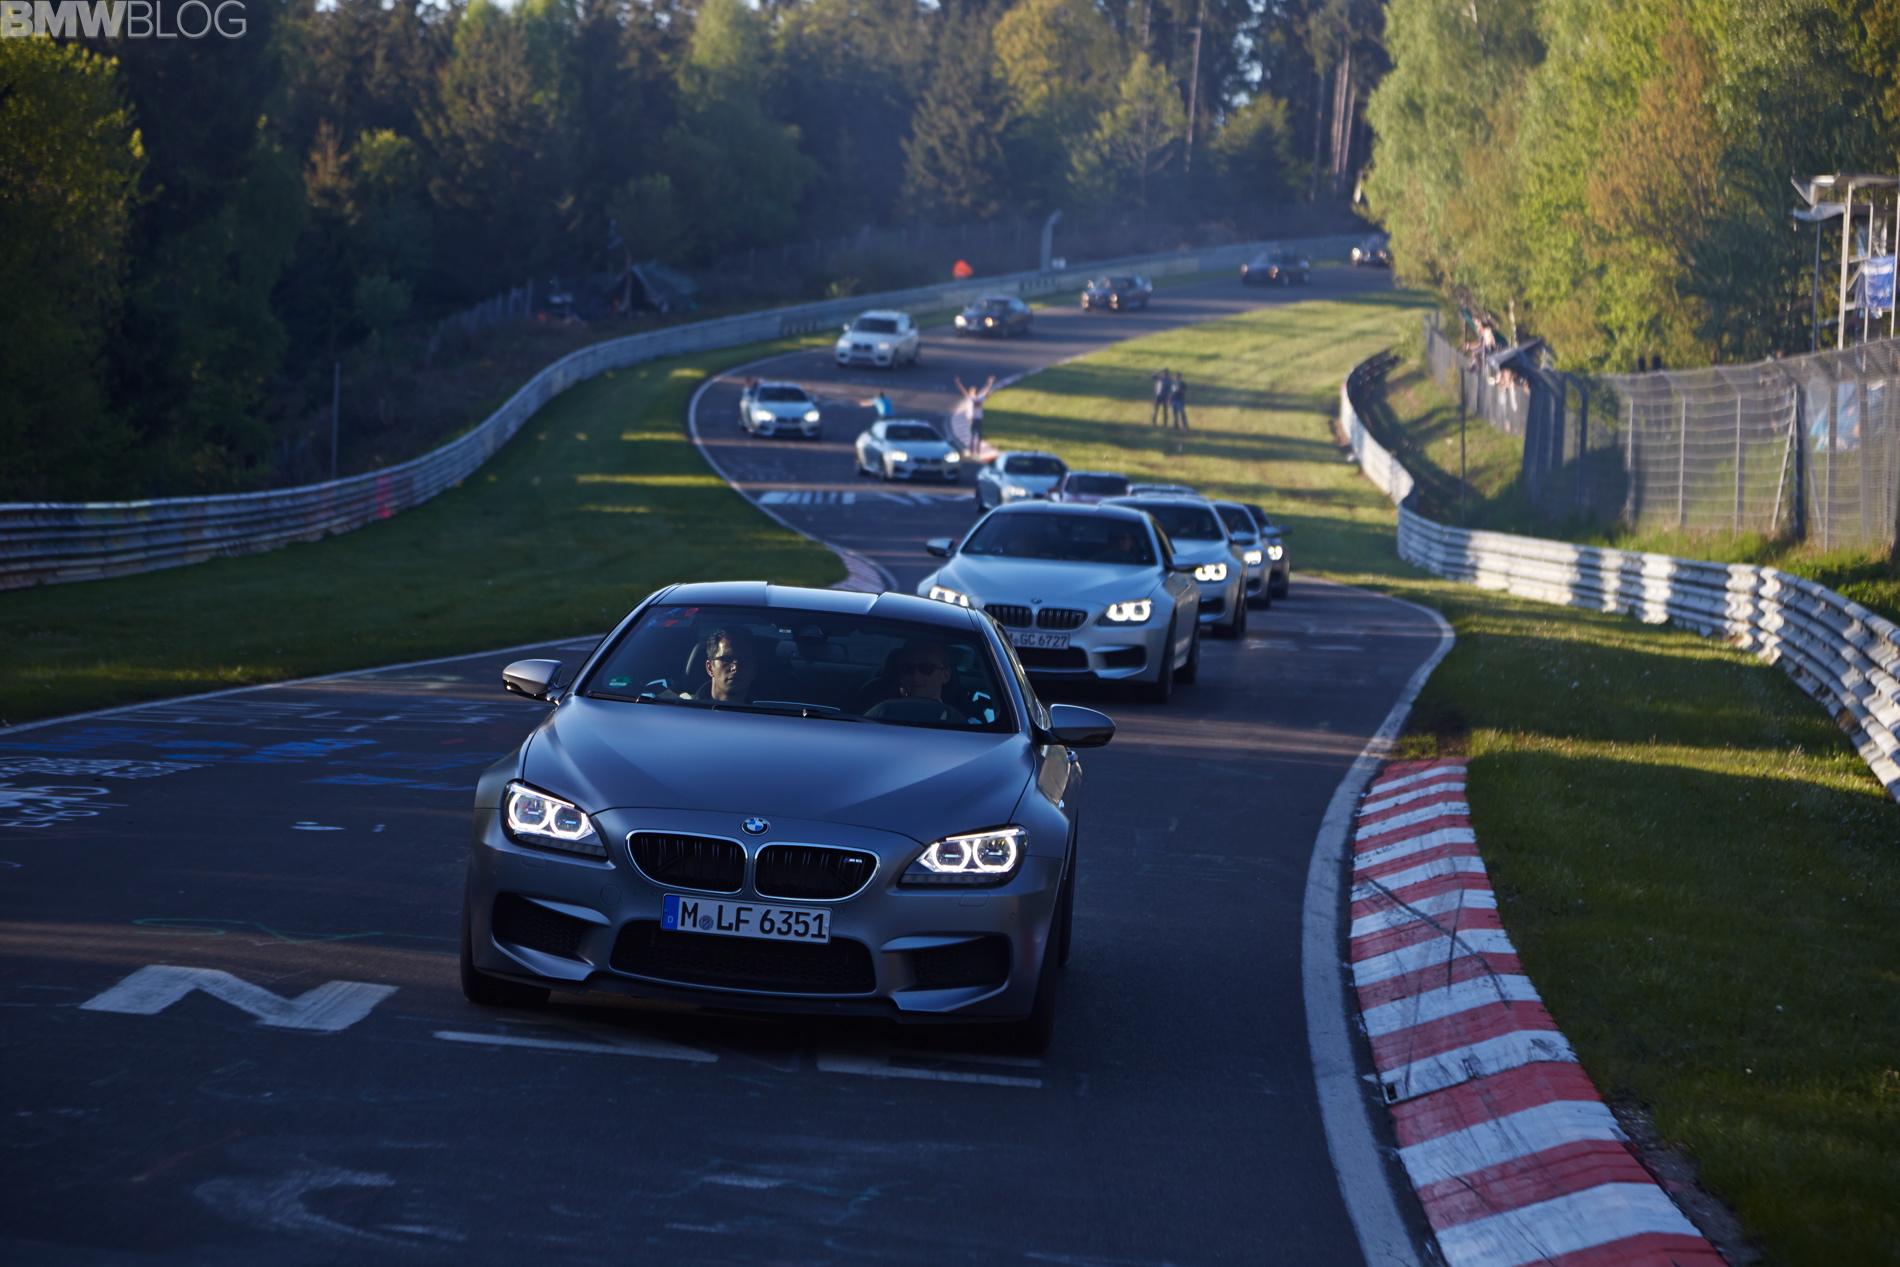 n 04 - Renntage auf dem Nürburgring mit dem BMW CLUB.